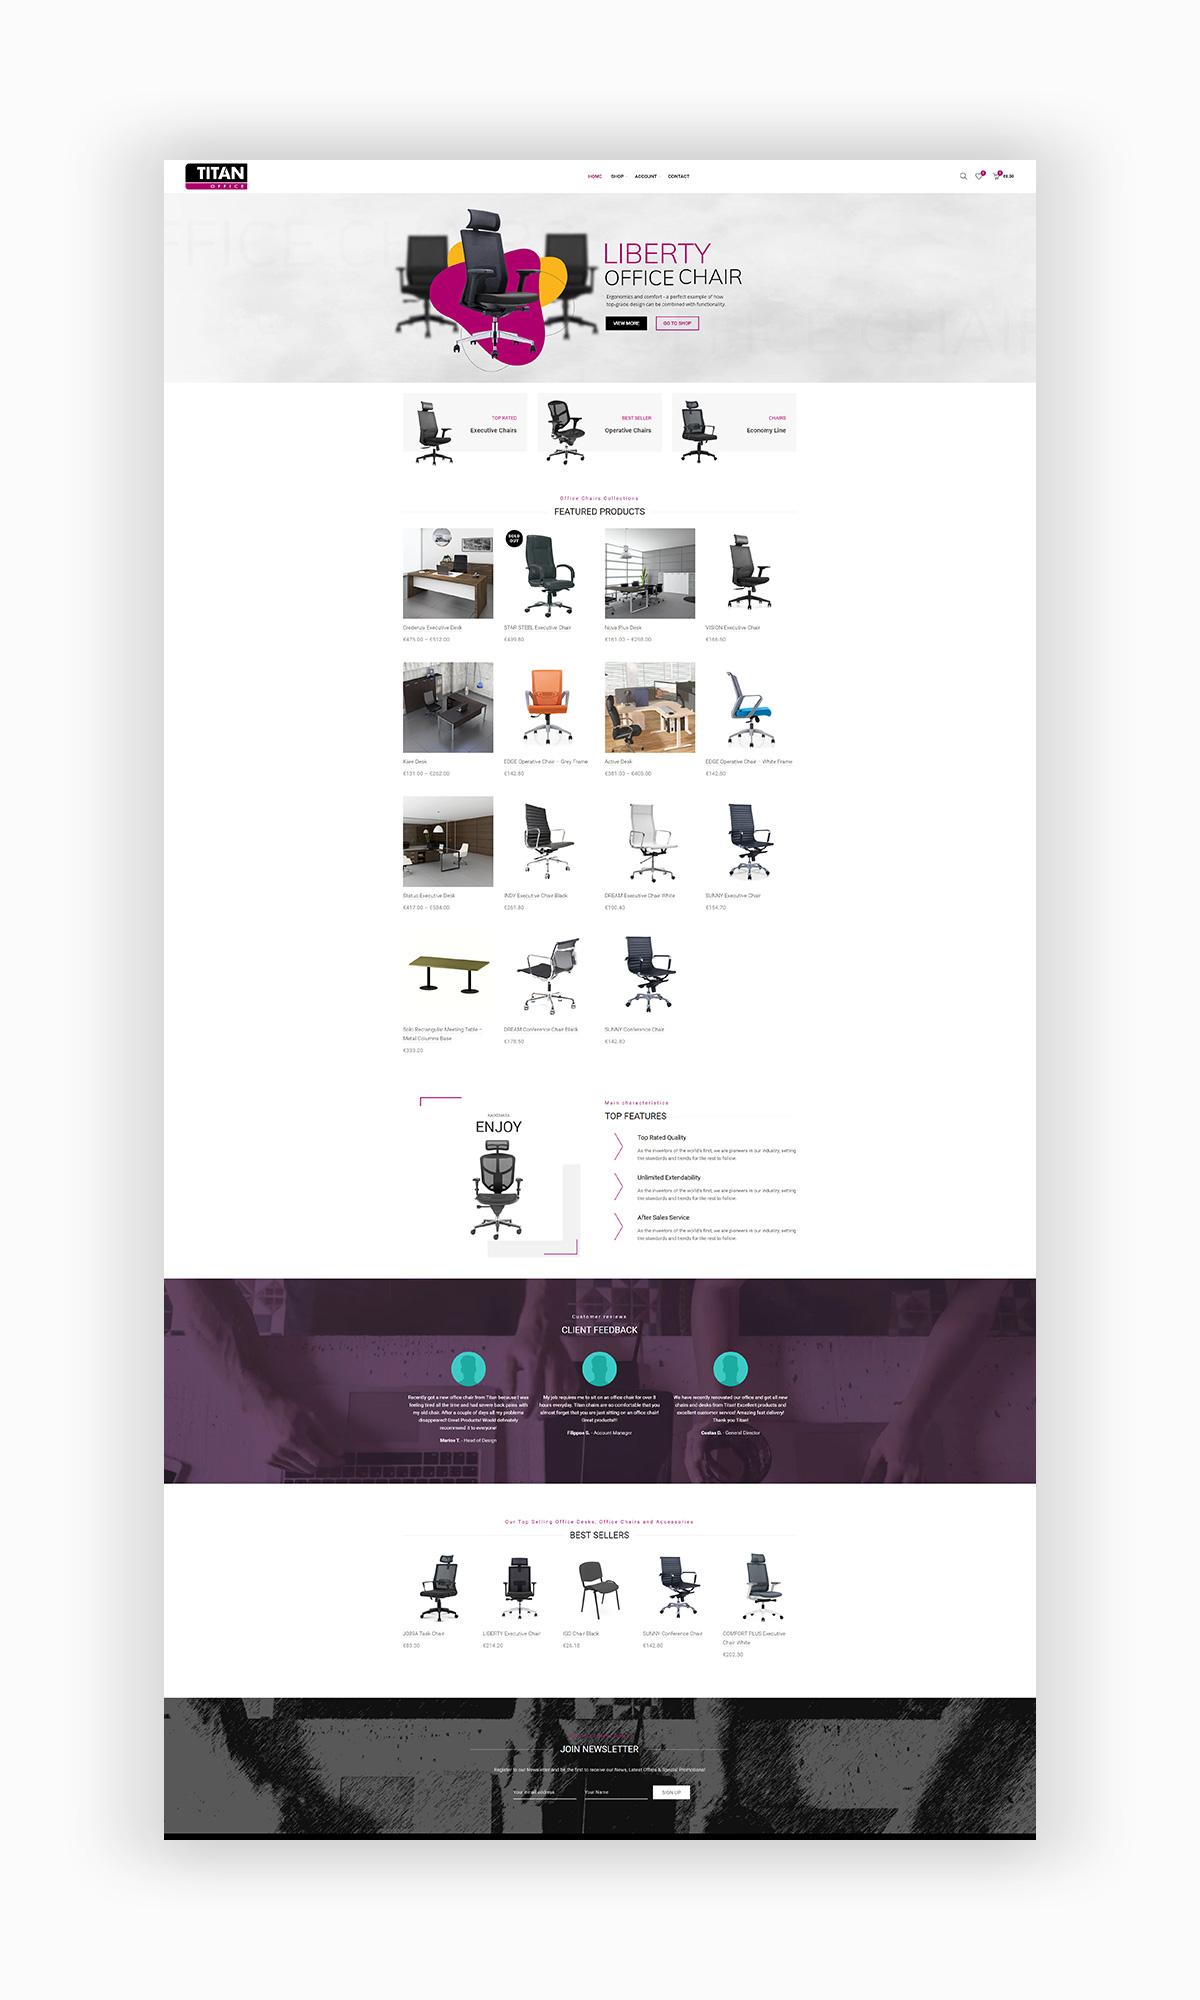 Titan Office Furniture